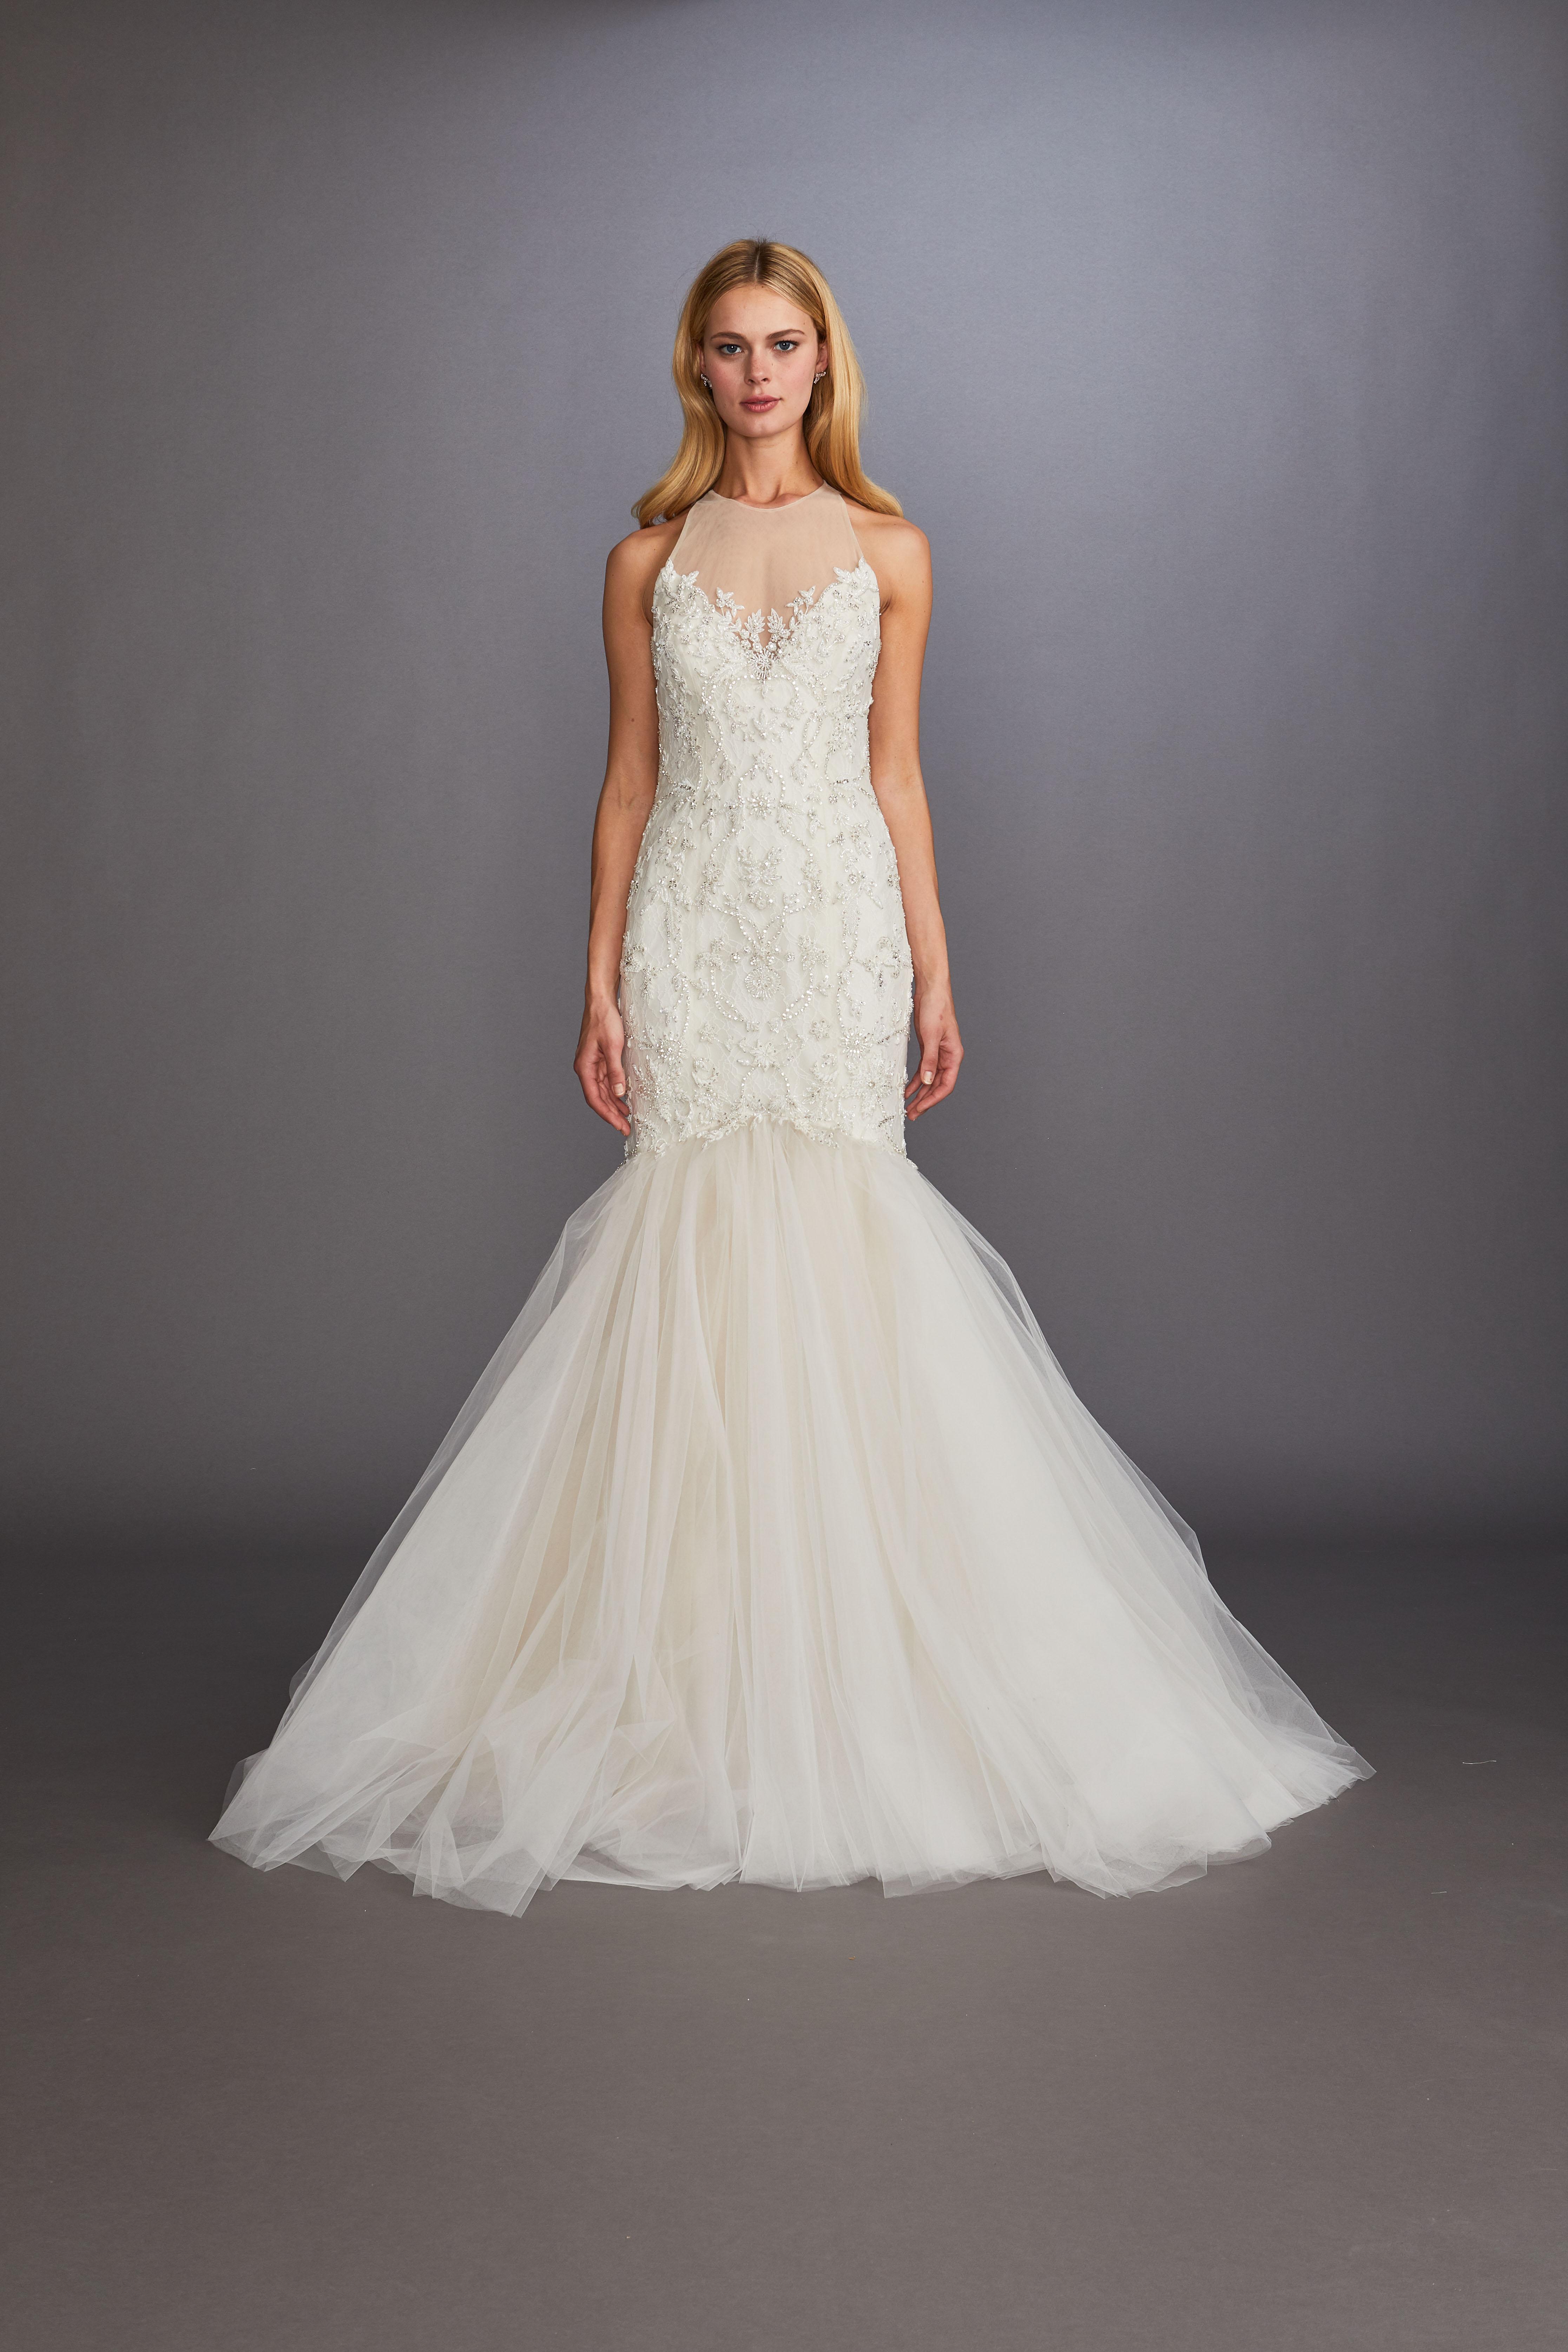 illusion hight neck sleeveless beaded glitter trumpet wedding dress Allison Webb Spring 2020